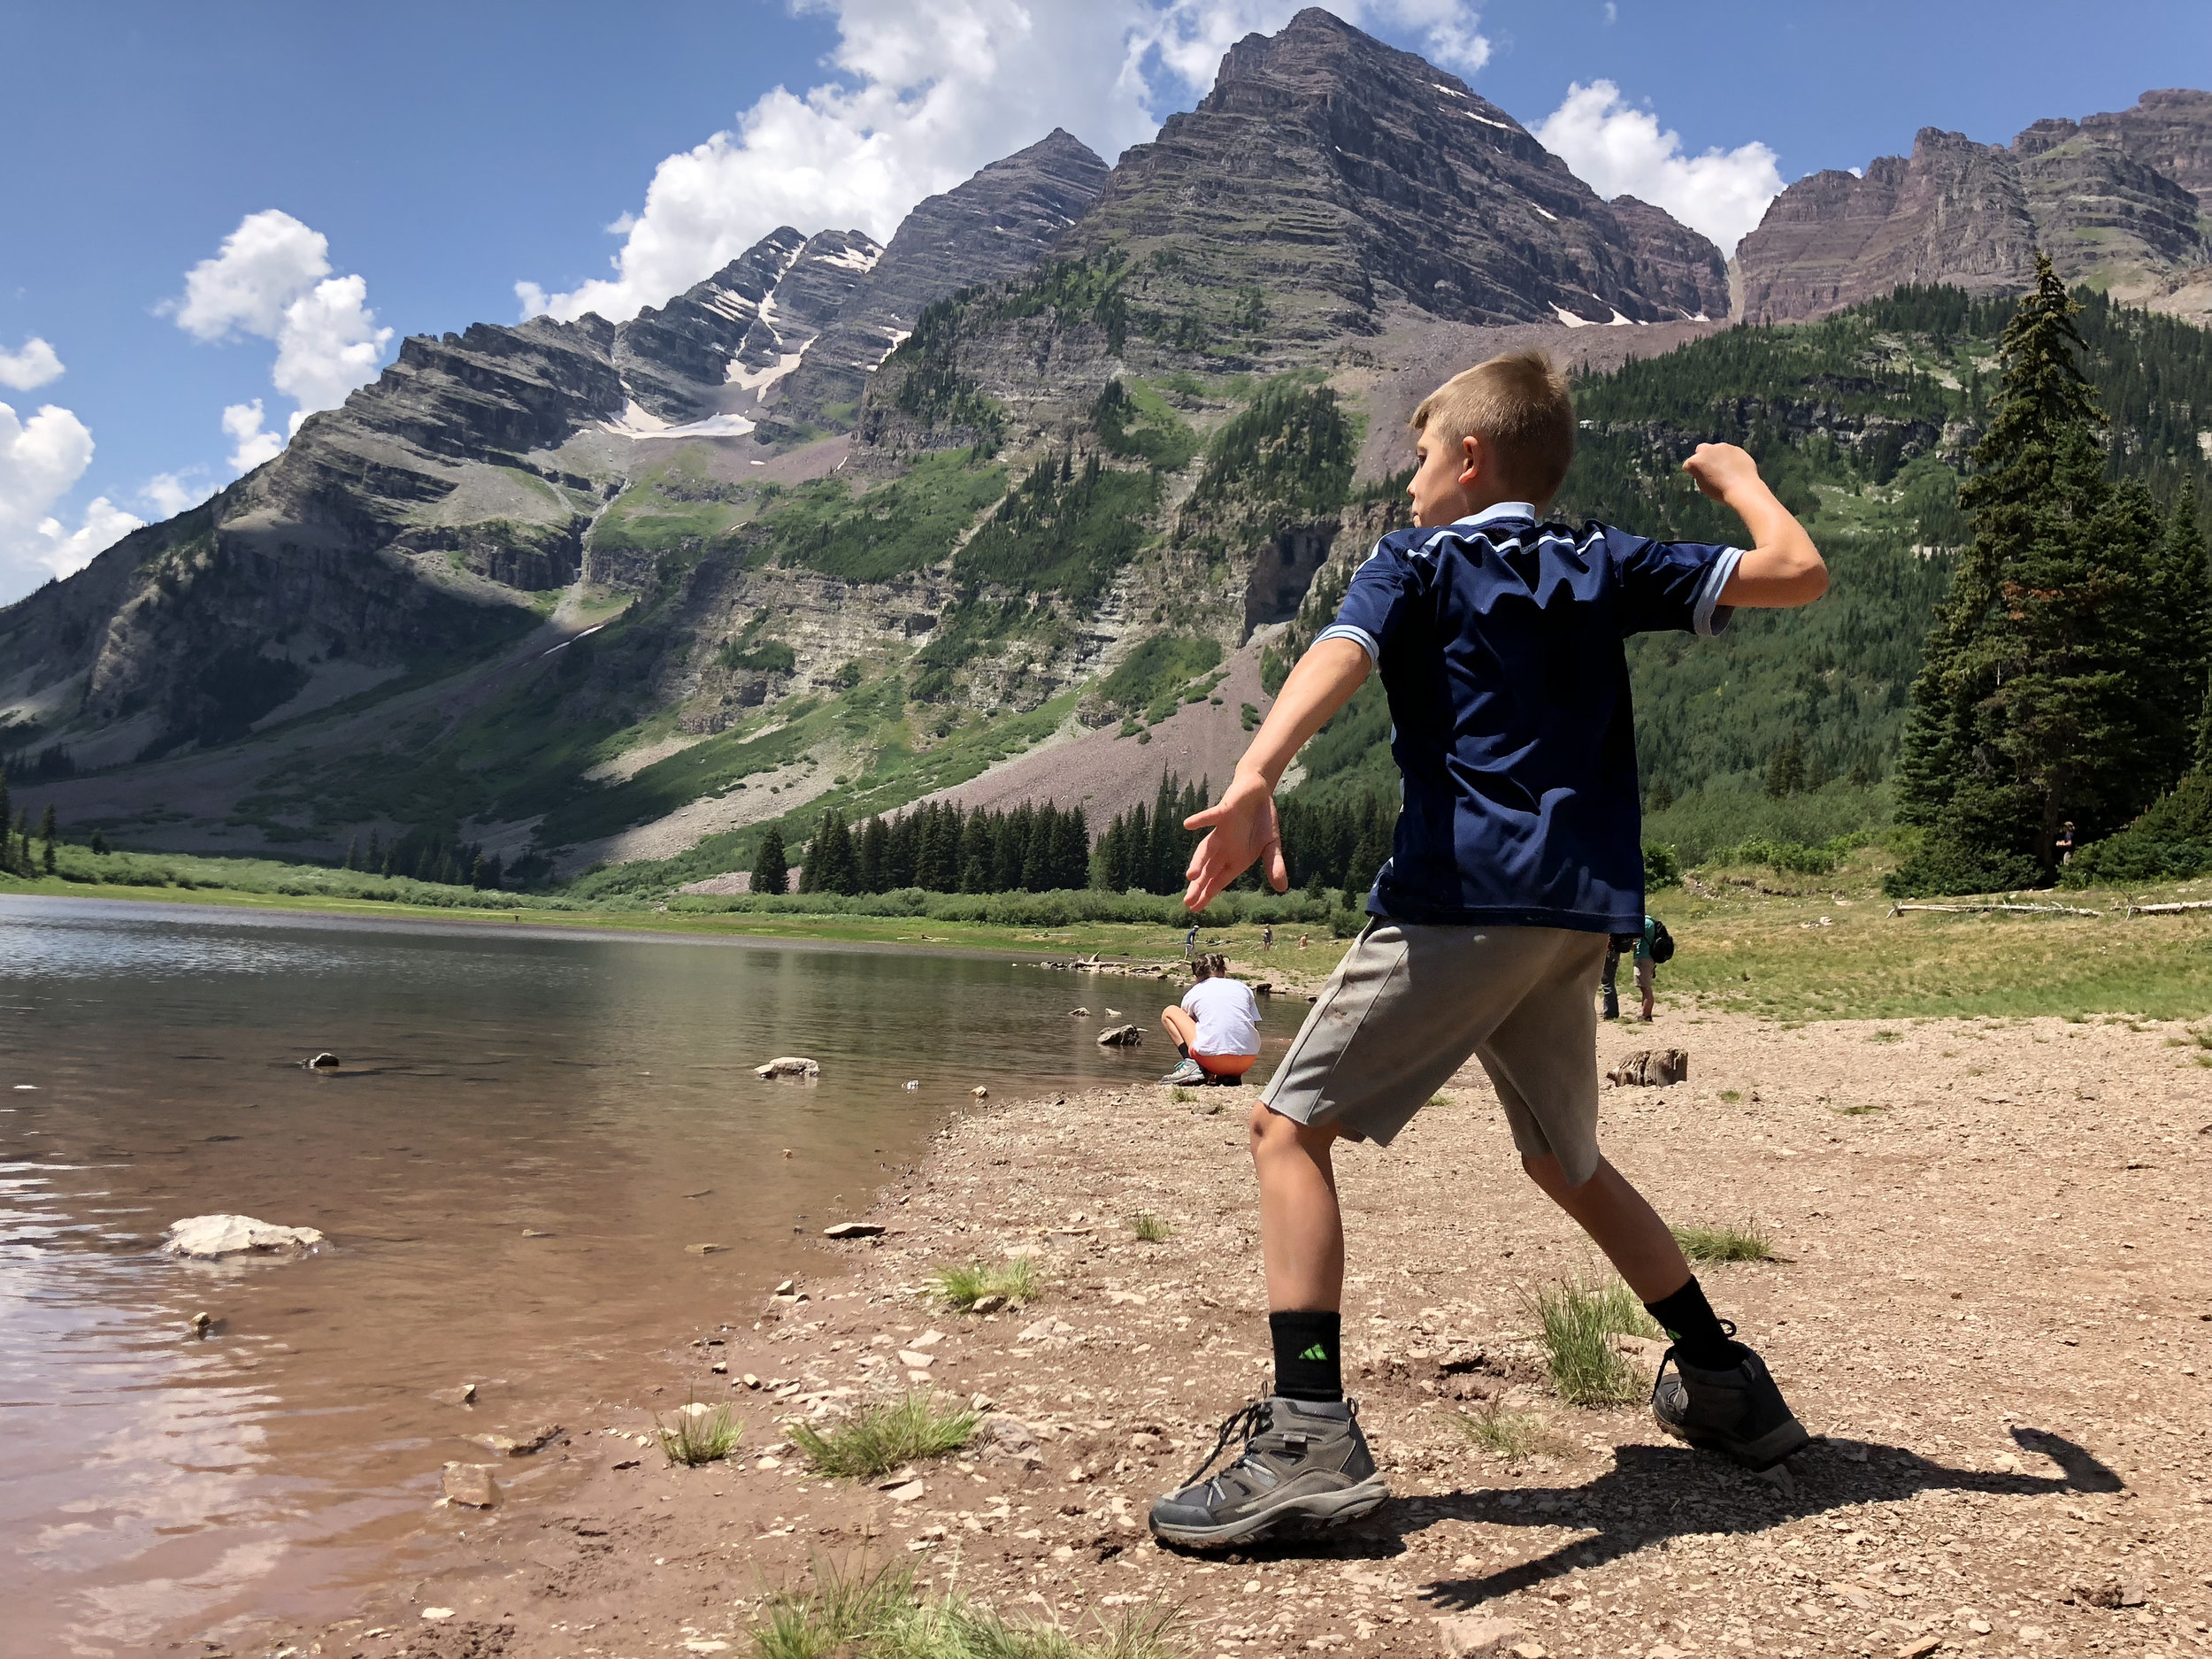 boy-skipping-rocks-crater-lake-maroon-bells